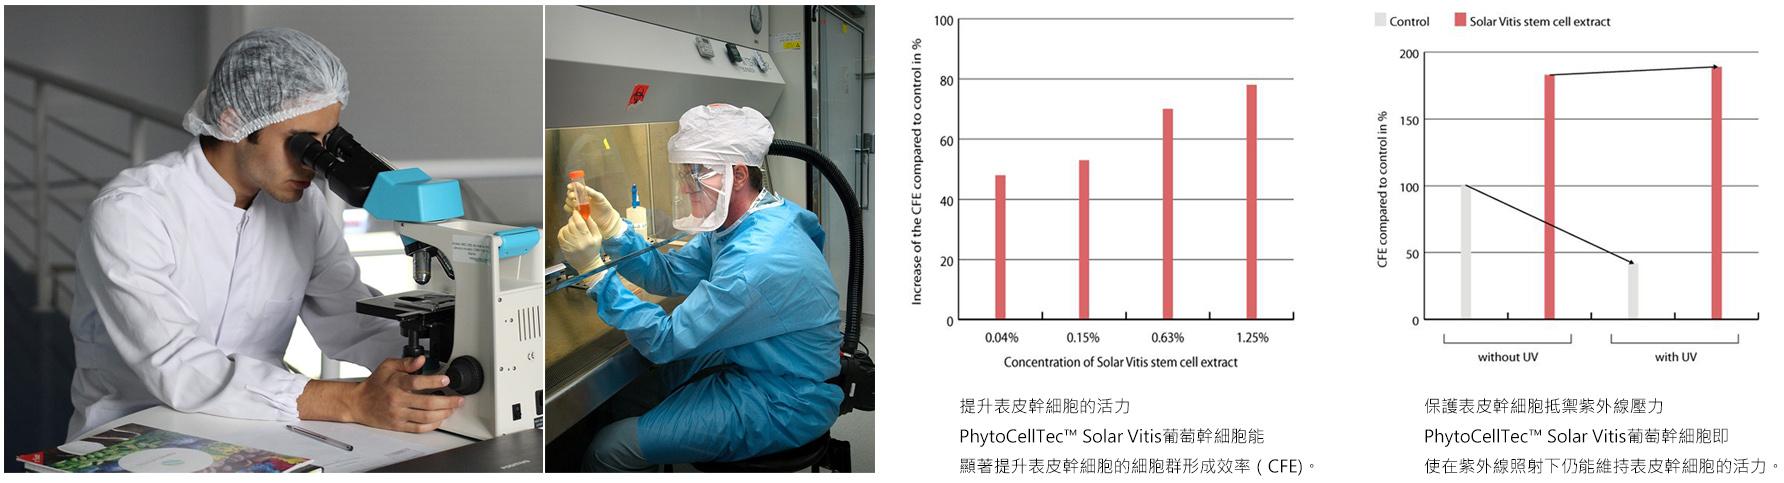 PhytoCellTec™ Solar Vitis葡萄幹細胞,能顯著提升表皮幹細胞的細胞群形成效率,即使在紫外線照射下仍能維持表皮幹細胞的活力